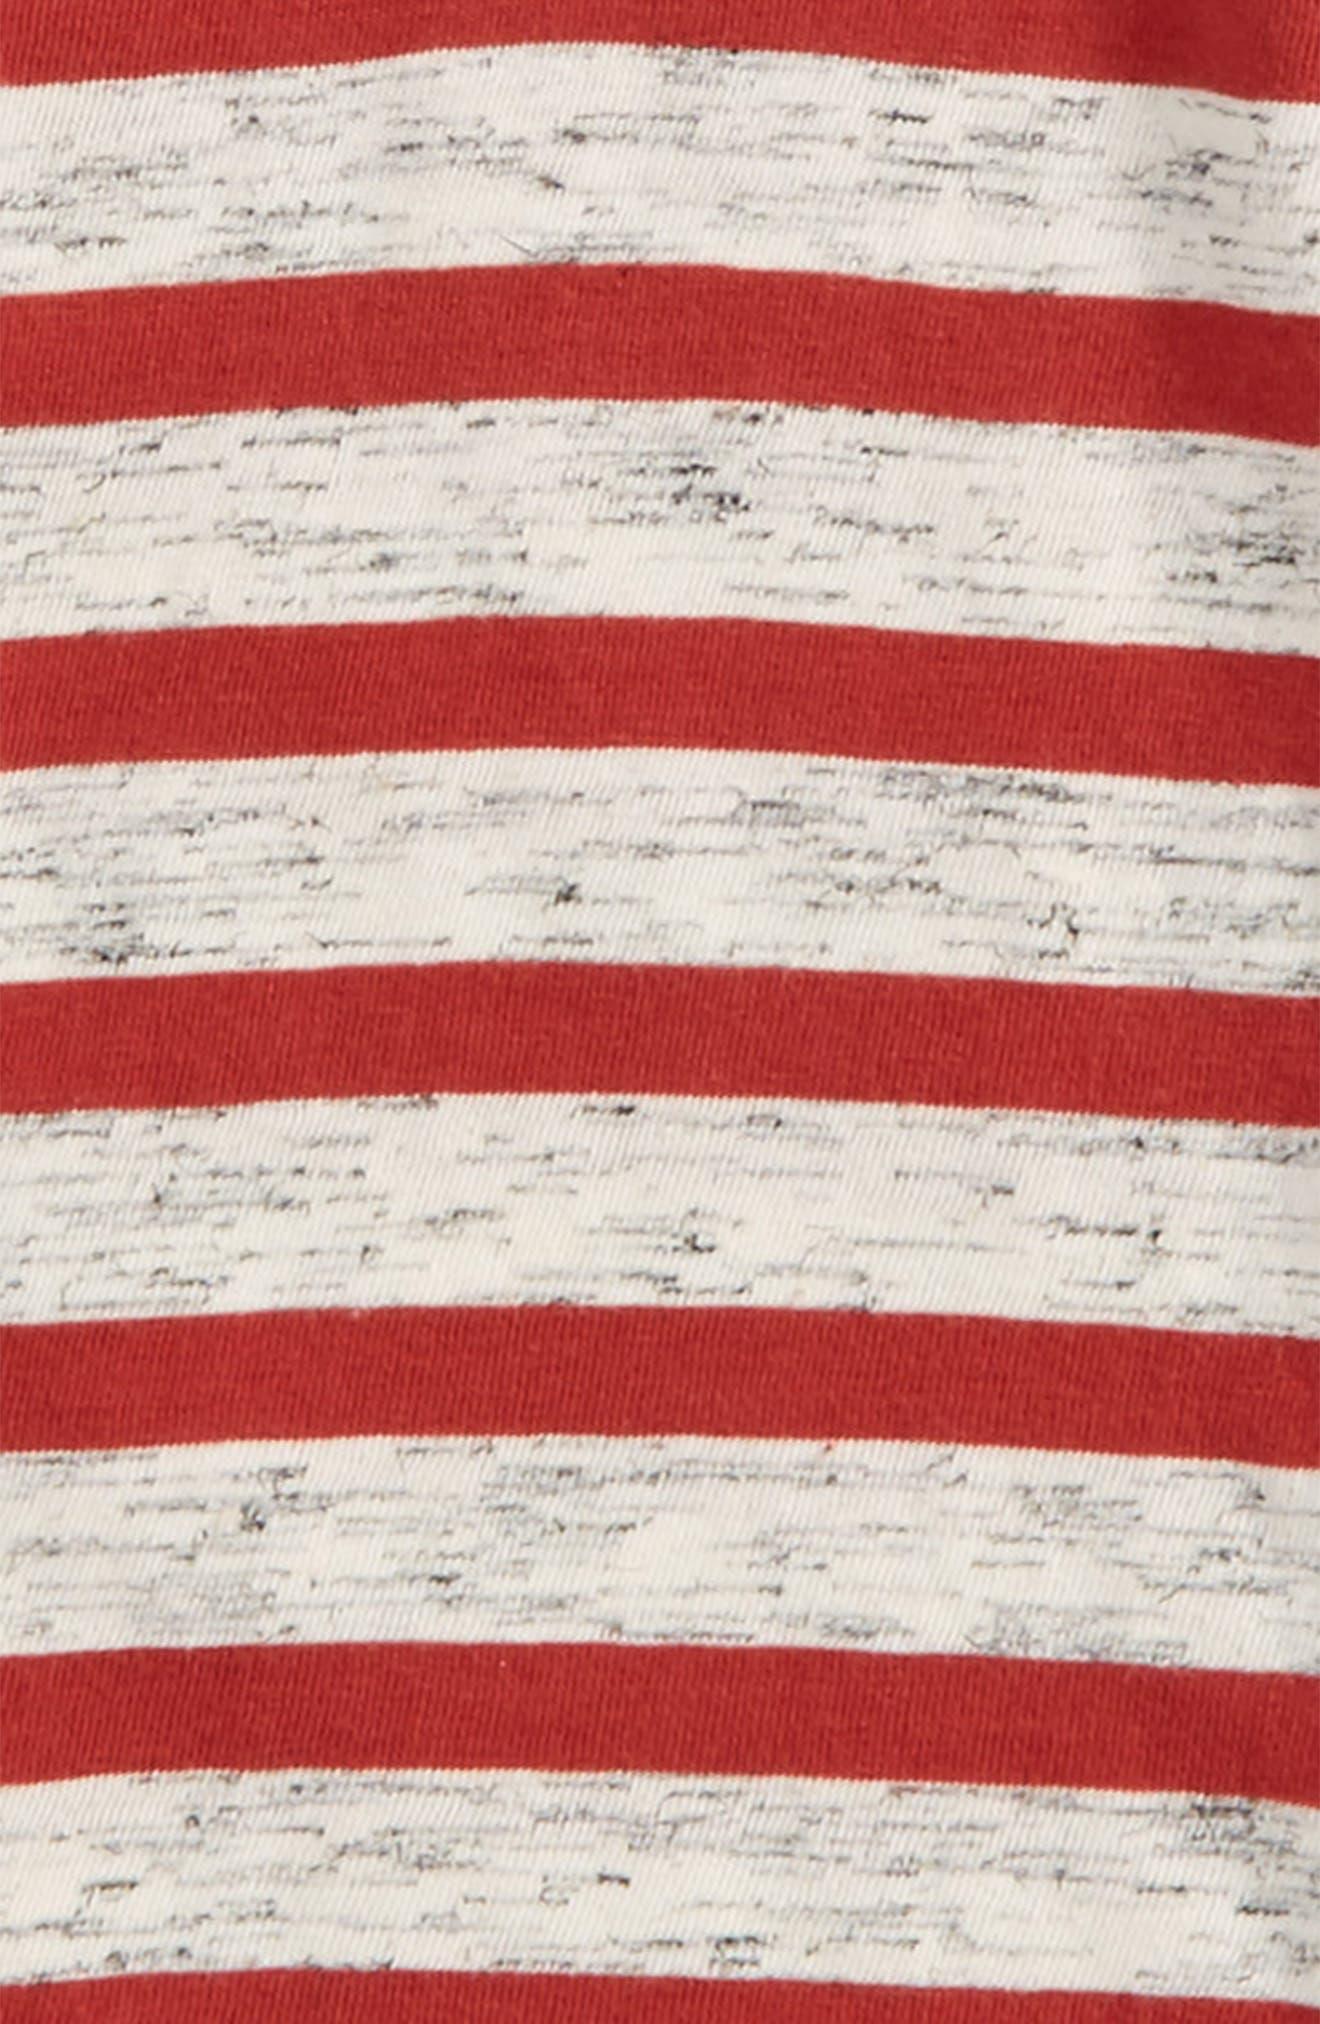 Hooded Raglan Layered T-Shirt,                             Alternate thumbnail 2, color,                             Rust Bossa Nova- Ivory Stripe